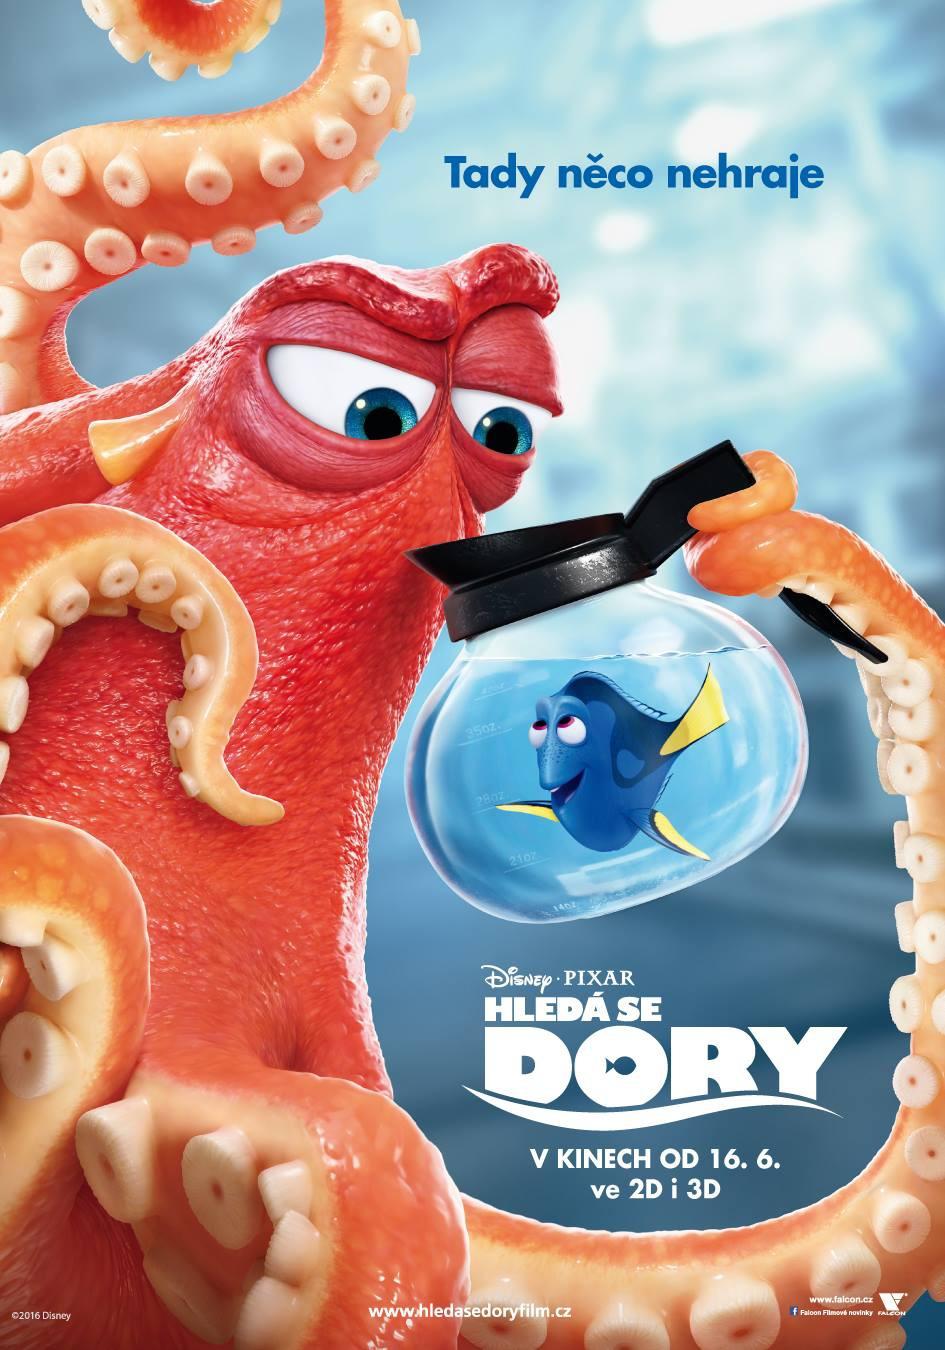 finding-dory-international-poster-03_pixar-post